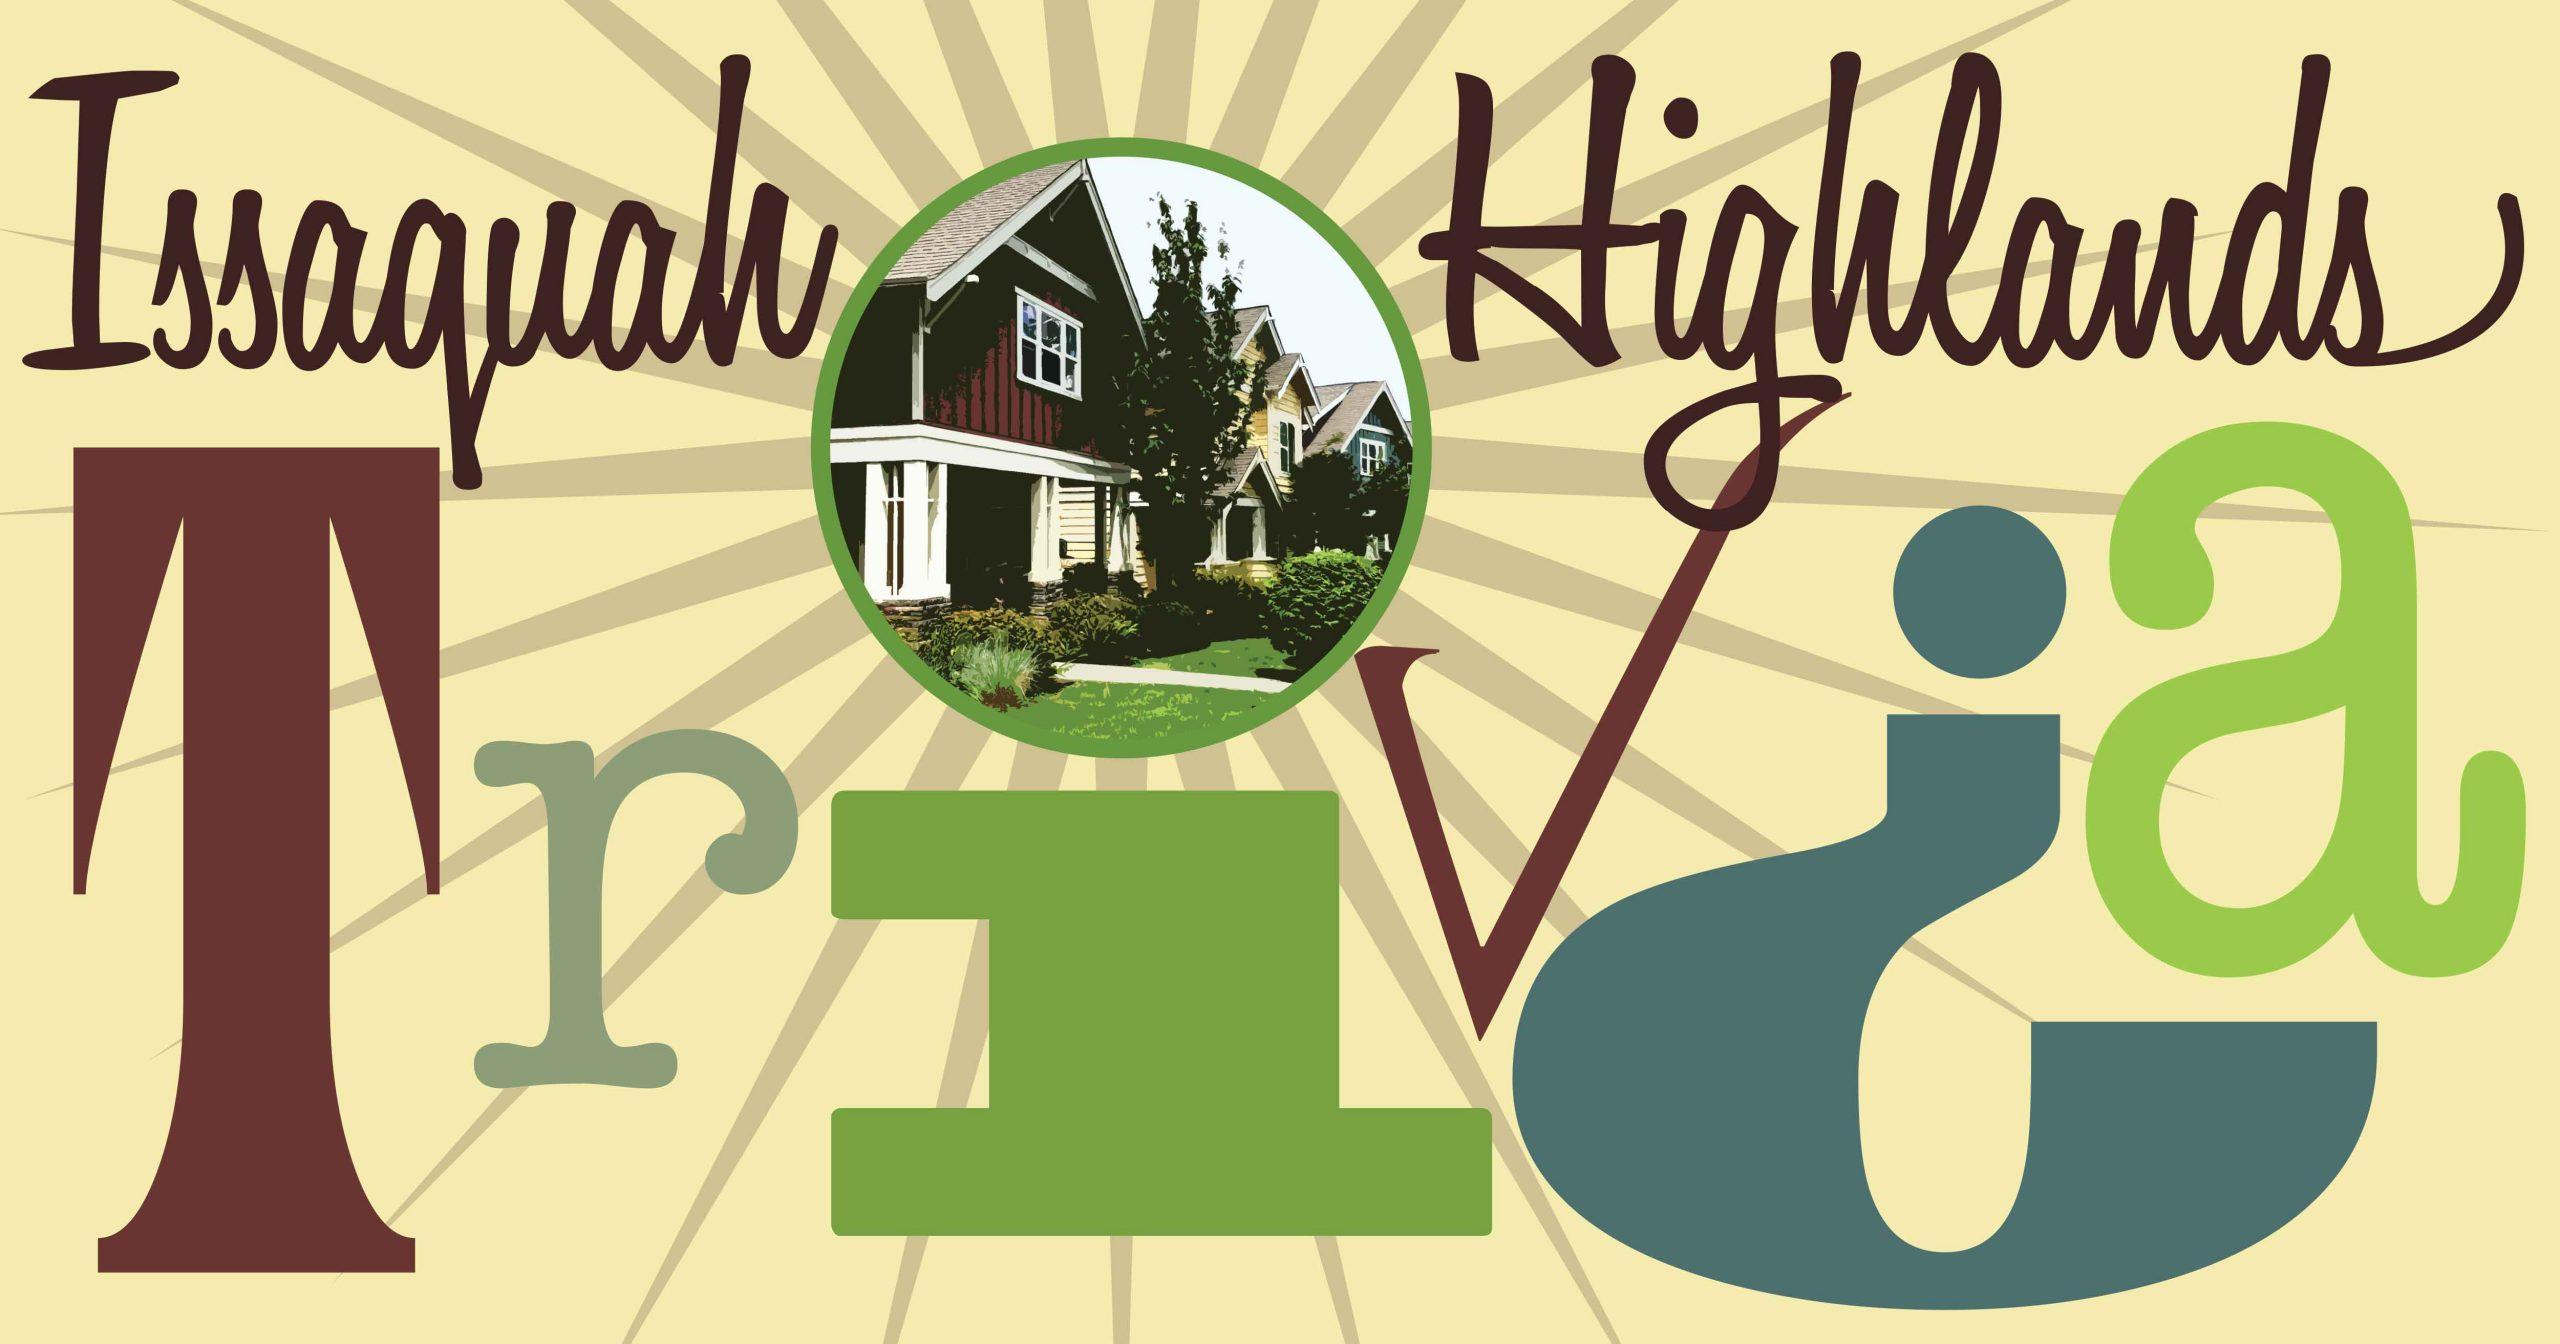 Issaquah Highlands Trivia